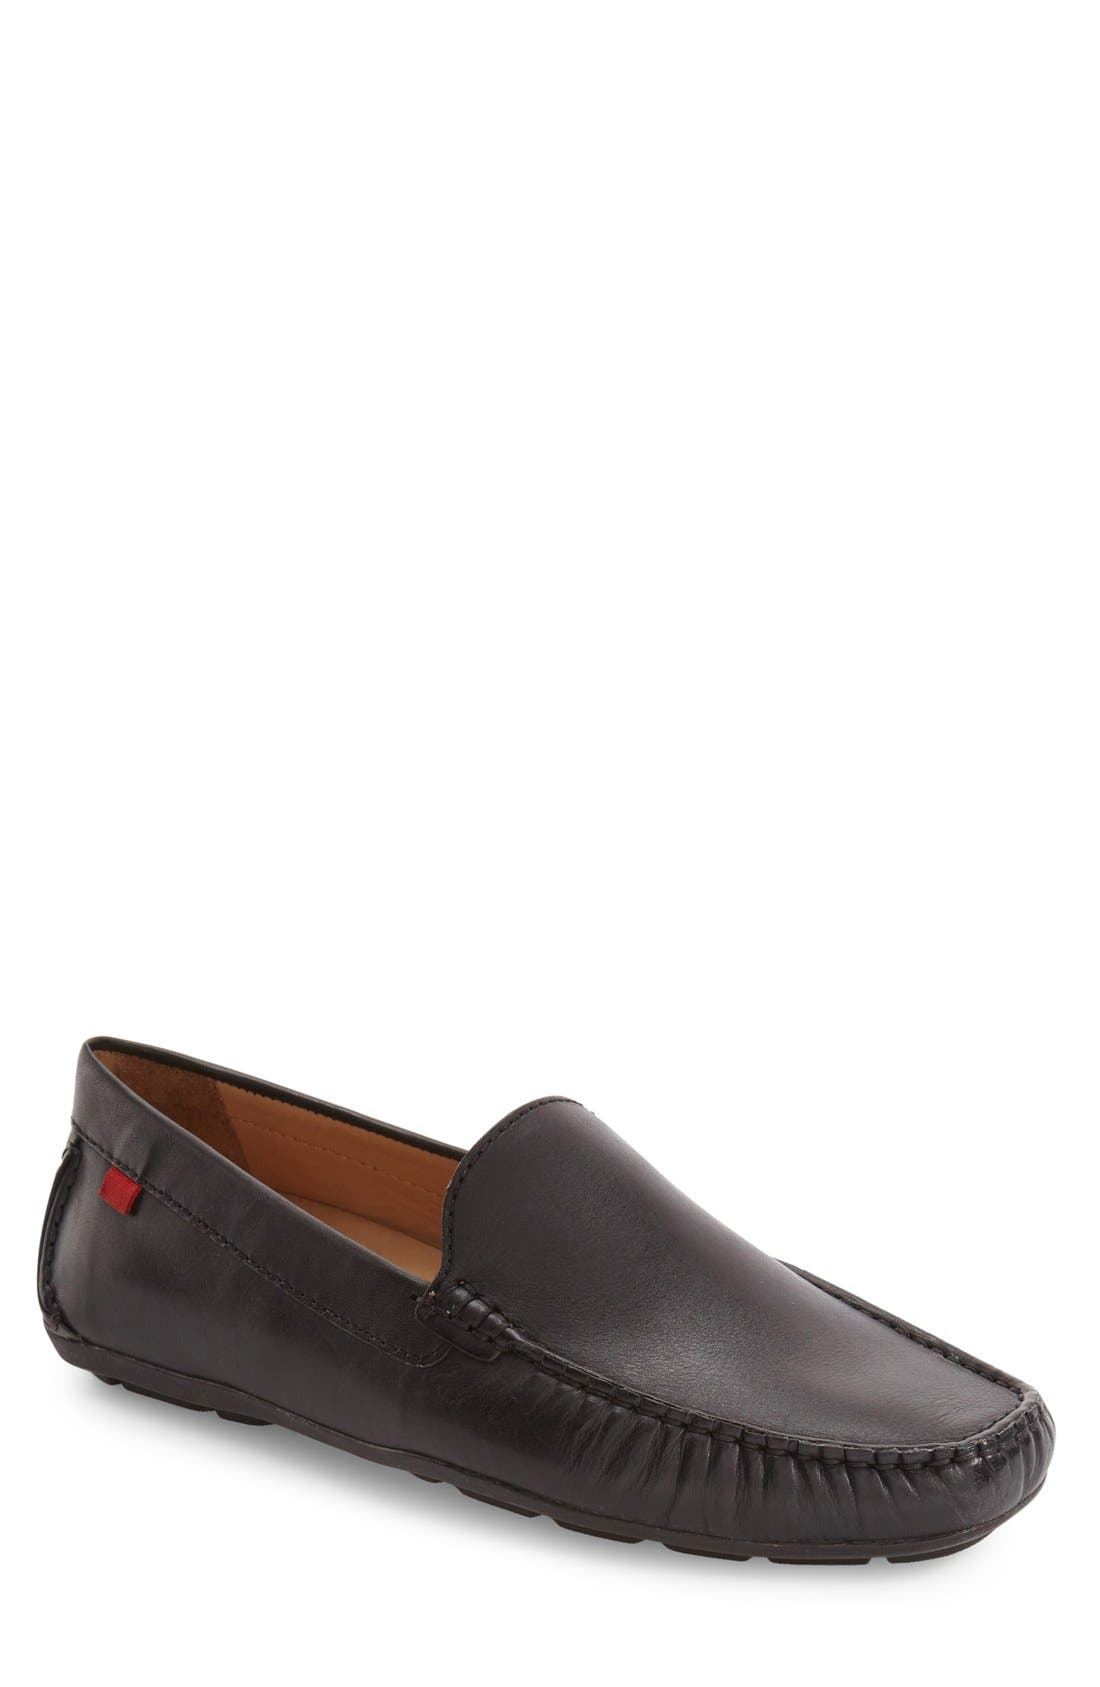 Venetian Driving Loafer,                             Main thumbnail 1, color,                             Black